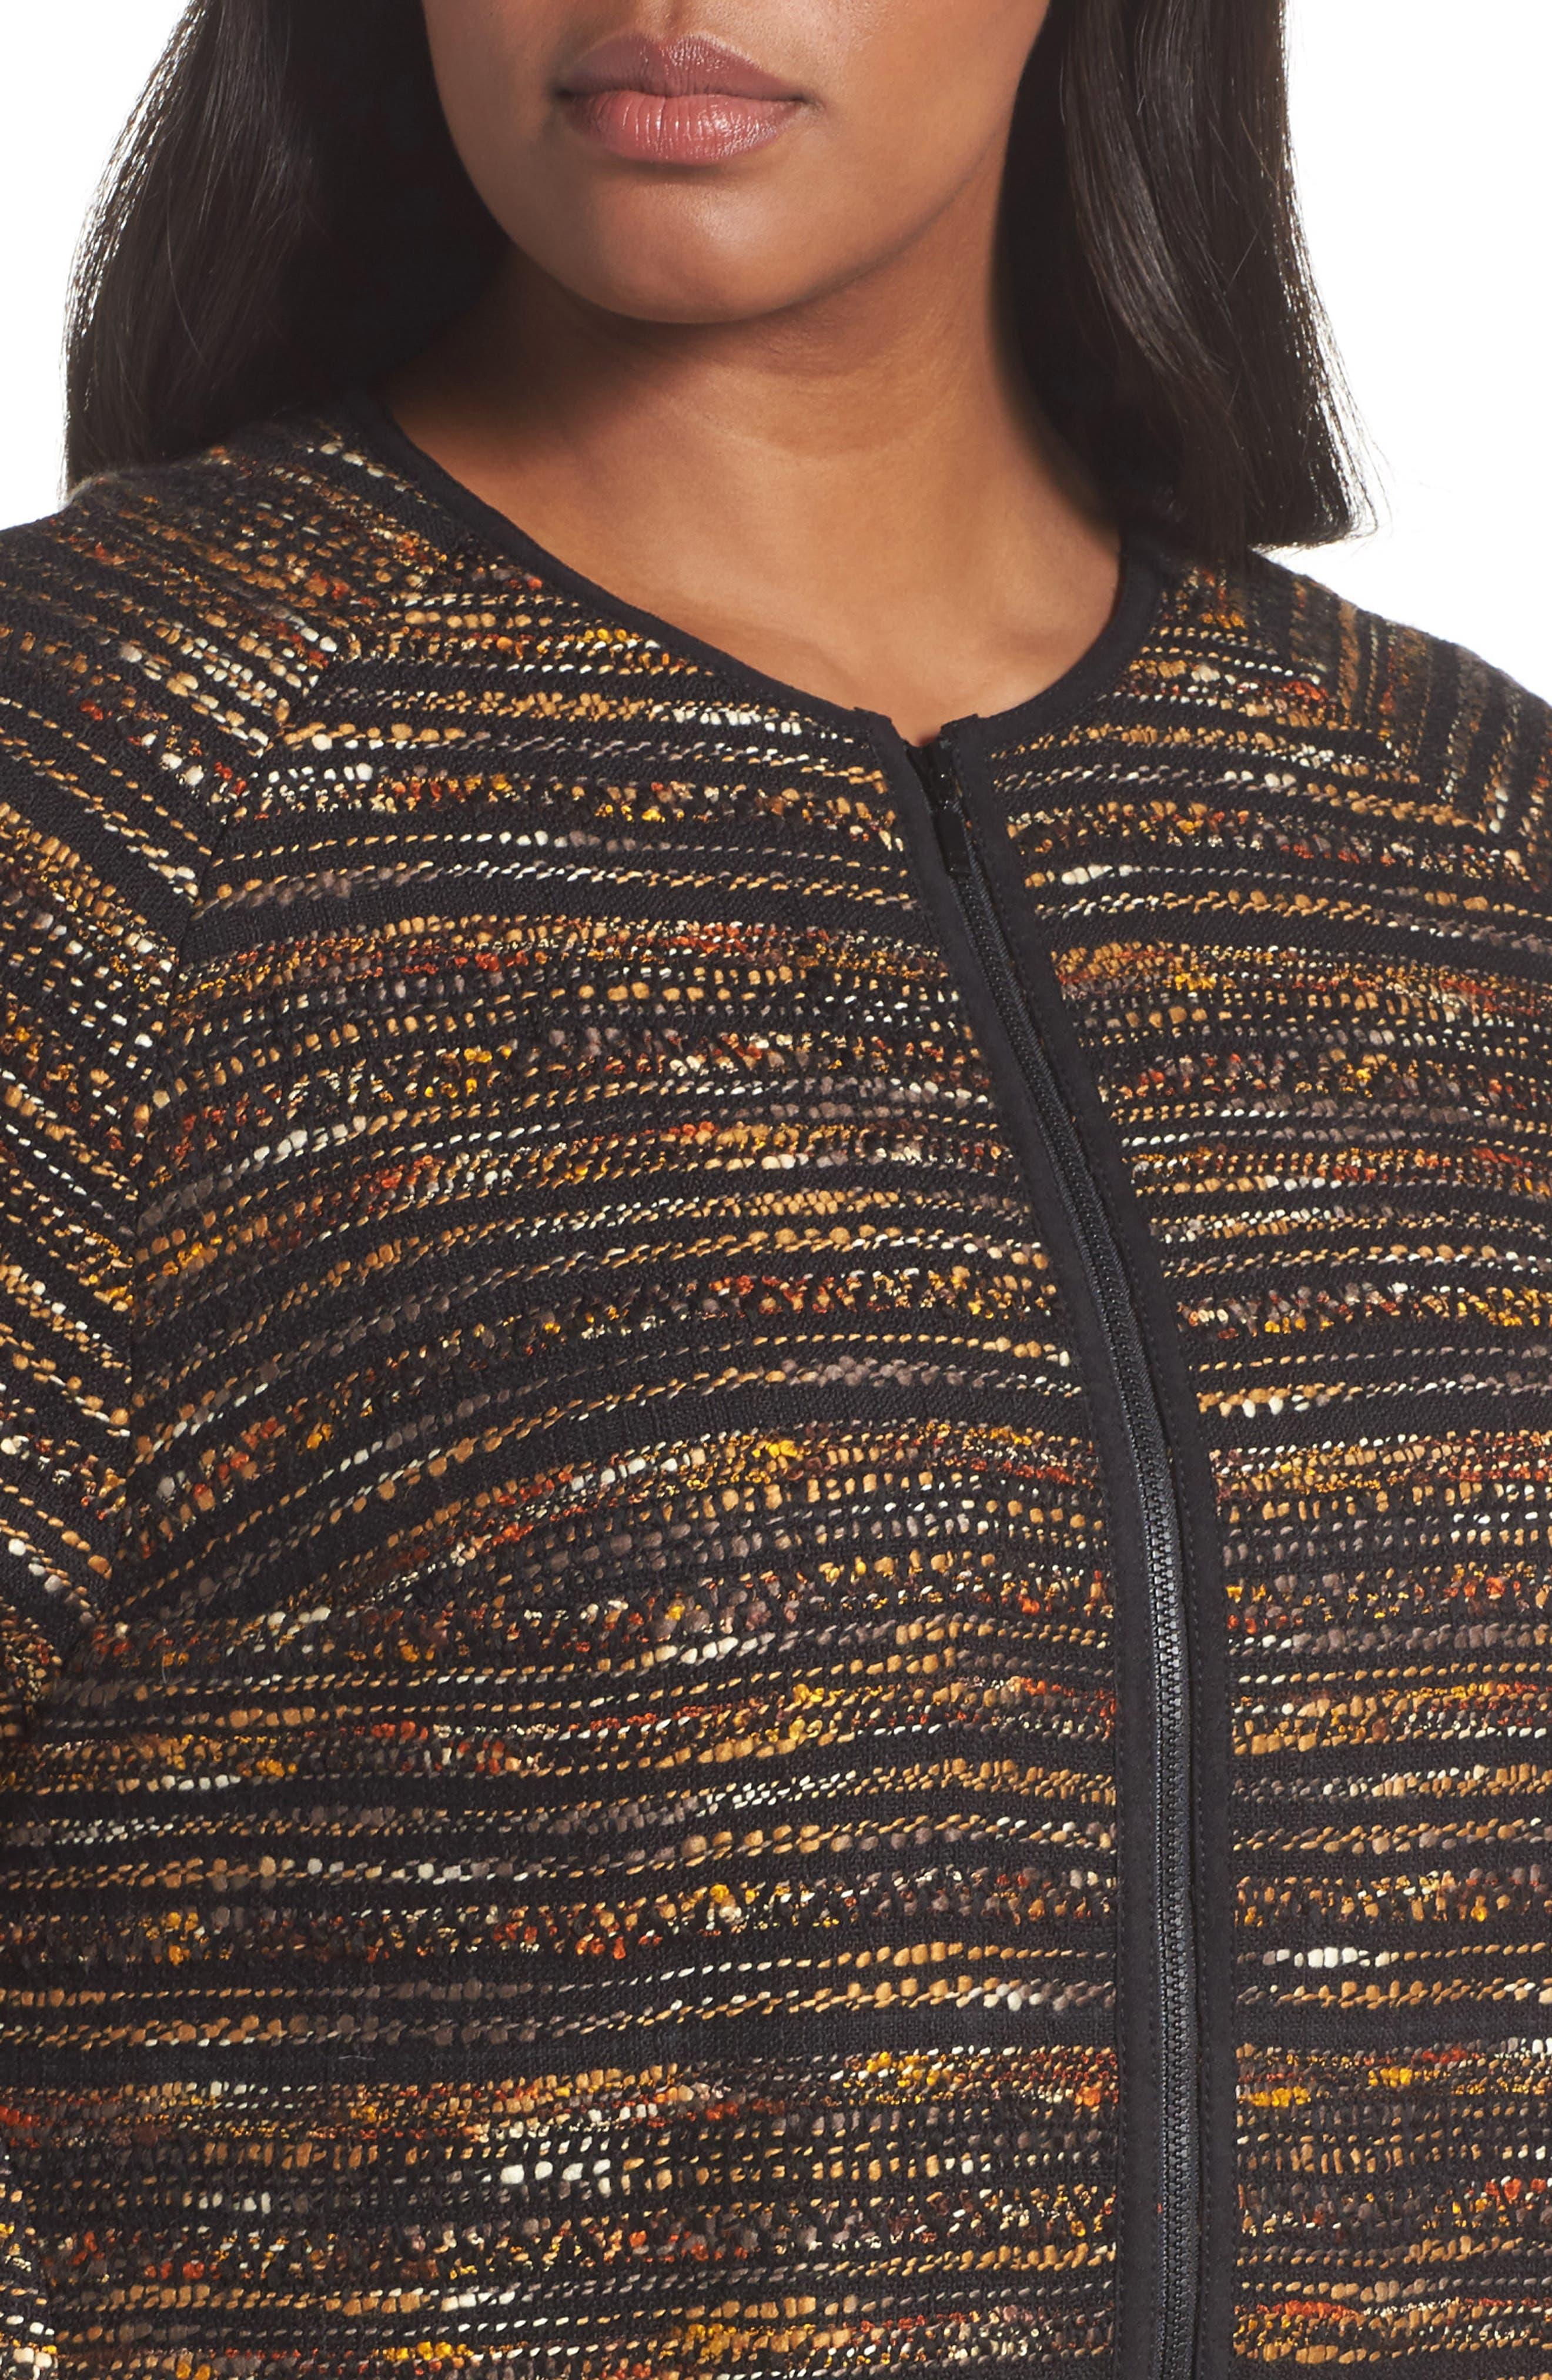 Alexa Tweed Jacket,                             Alternate thumbnail 4, color,                             003